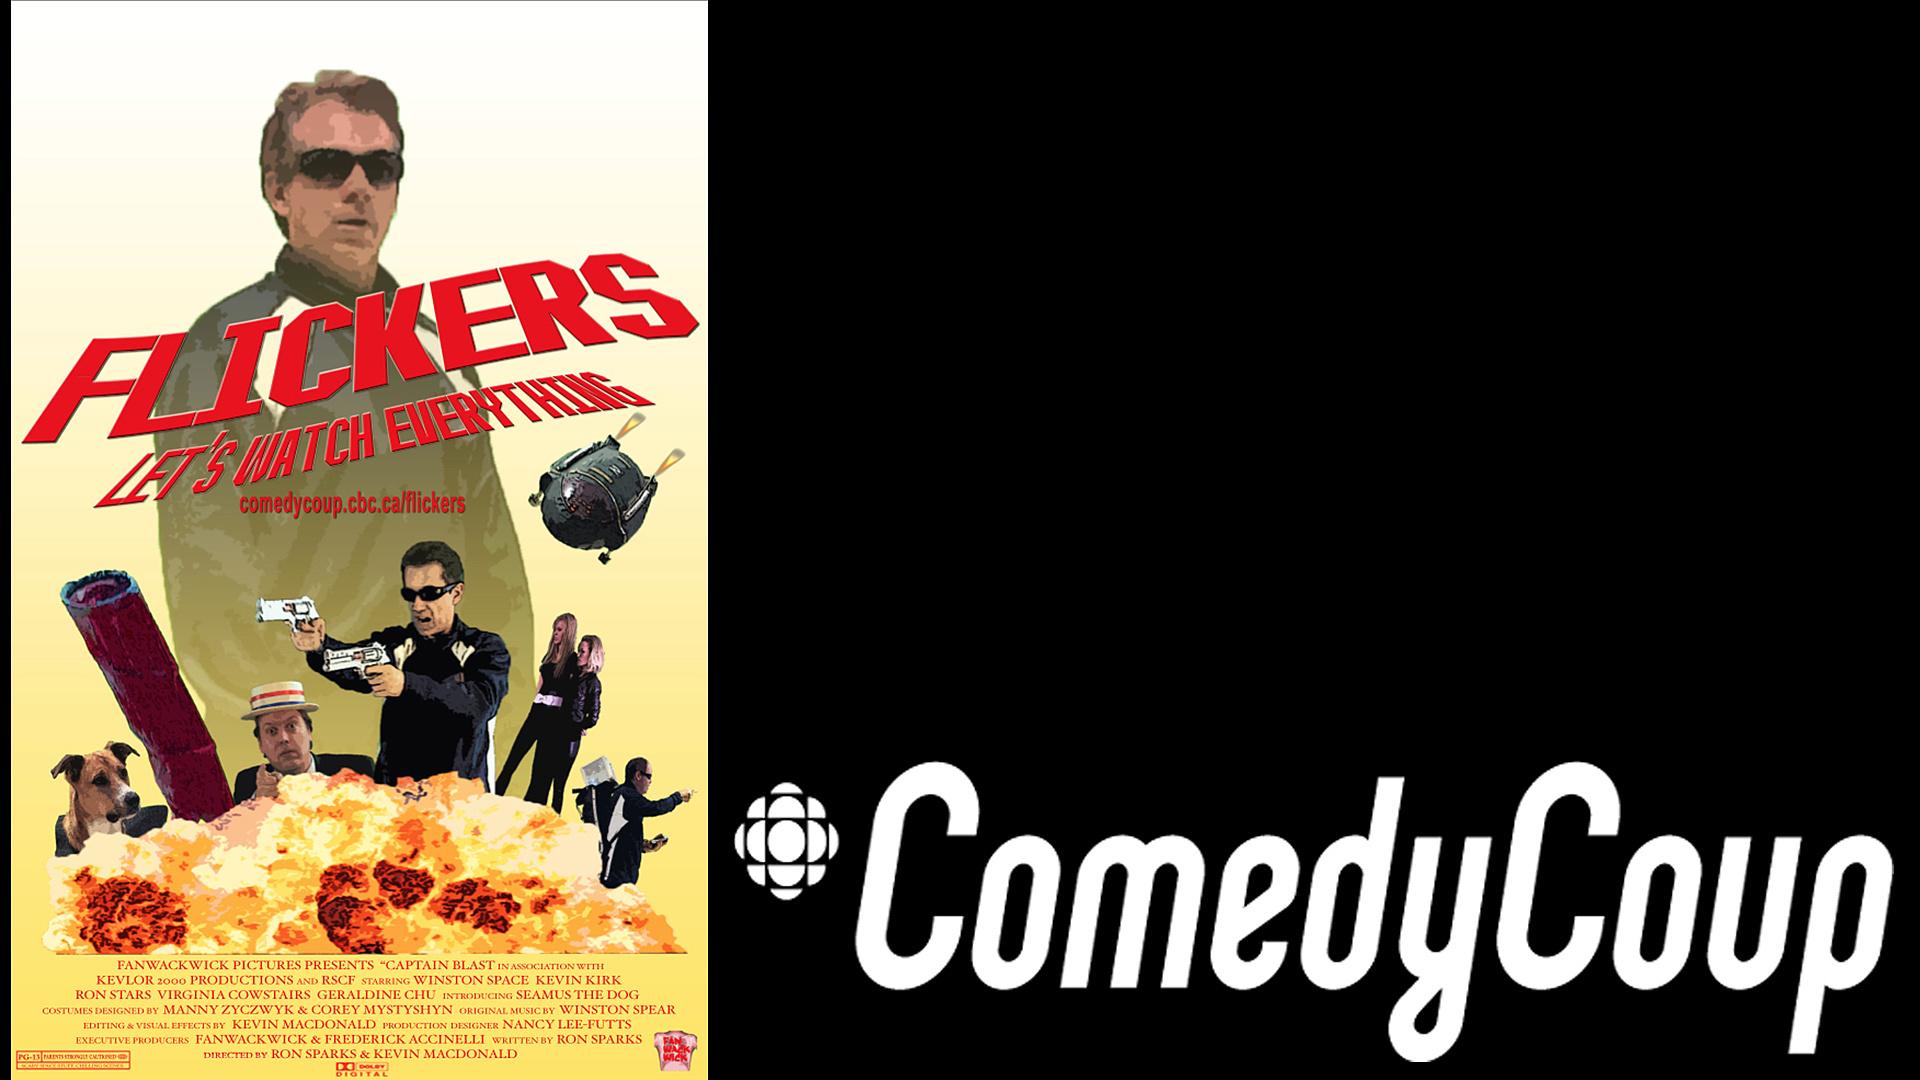 Week 4 Key It: Poster B Flickers!